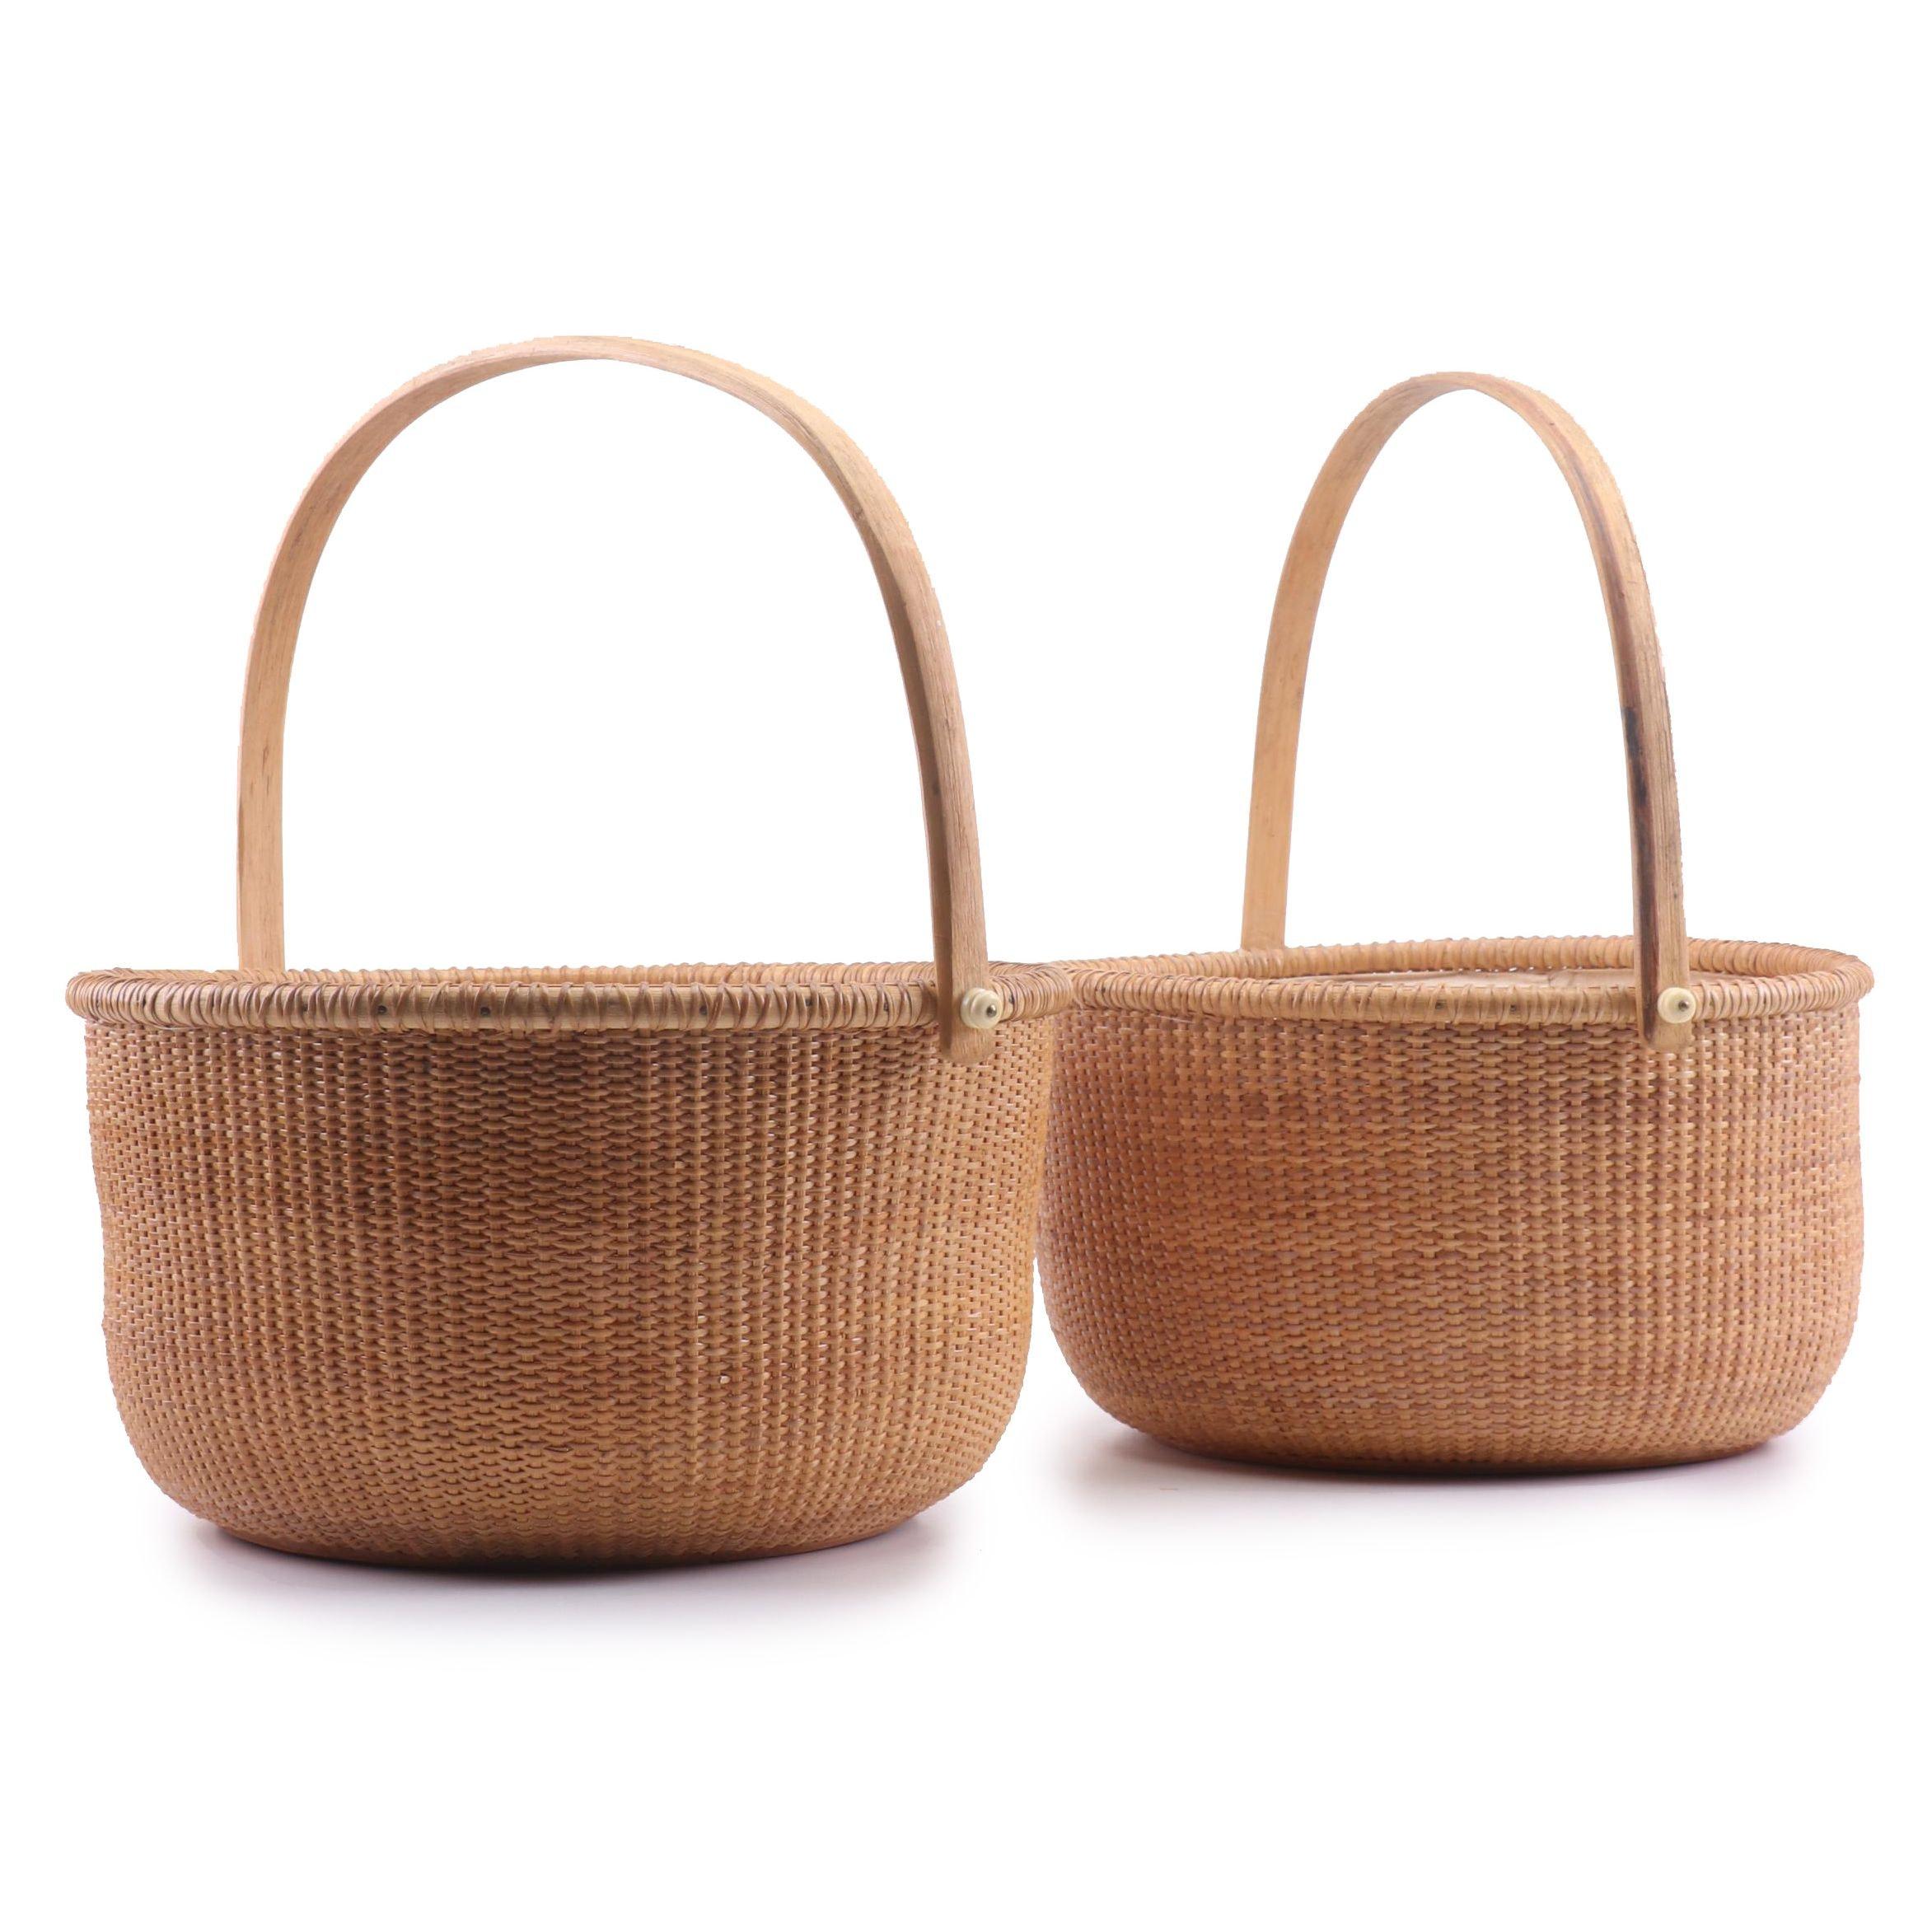 Woven Rattan Nantucket Baskets with Linen Liners